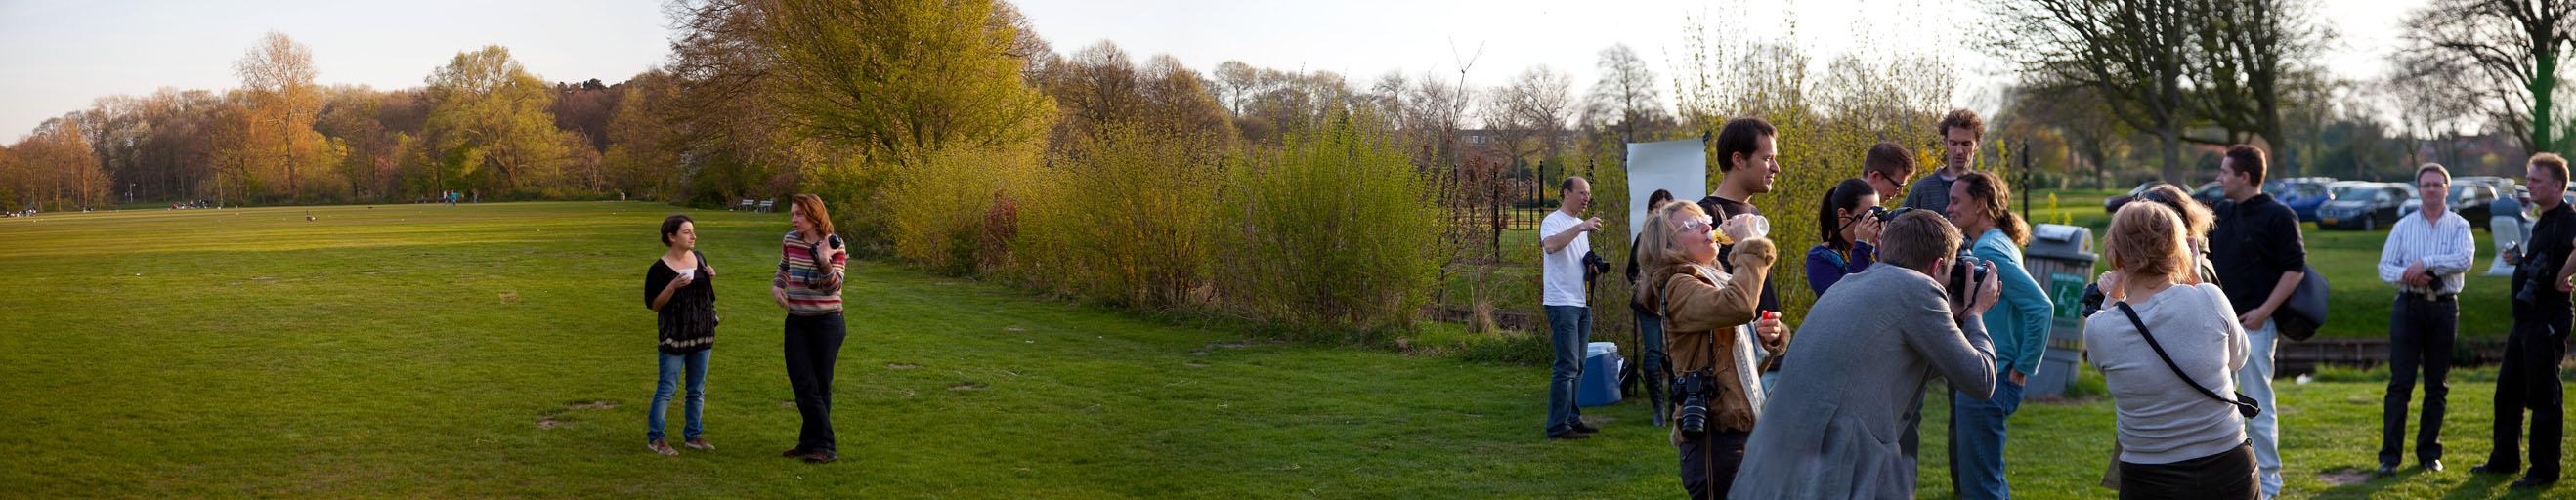 Panorama at Westbroekpark